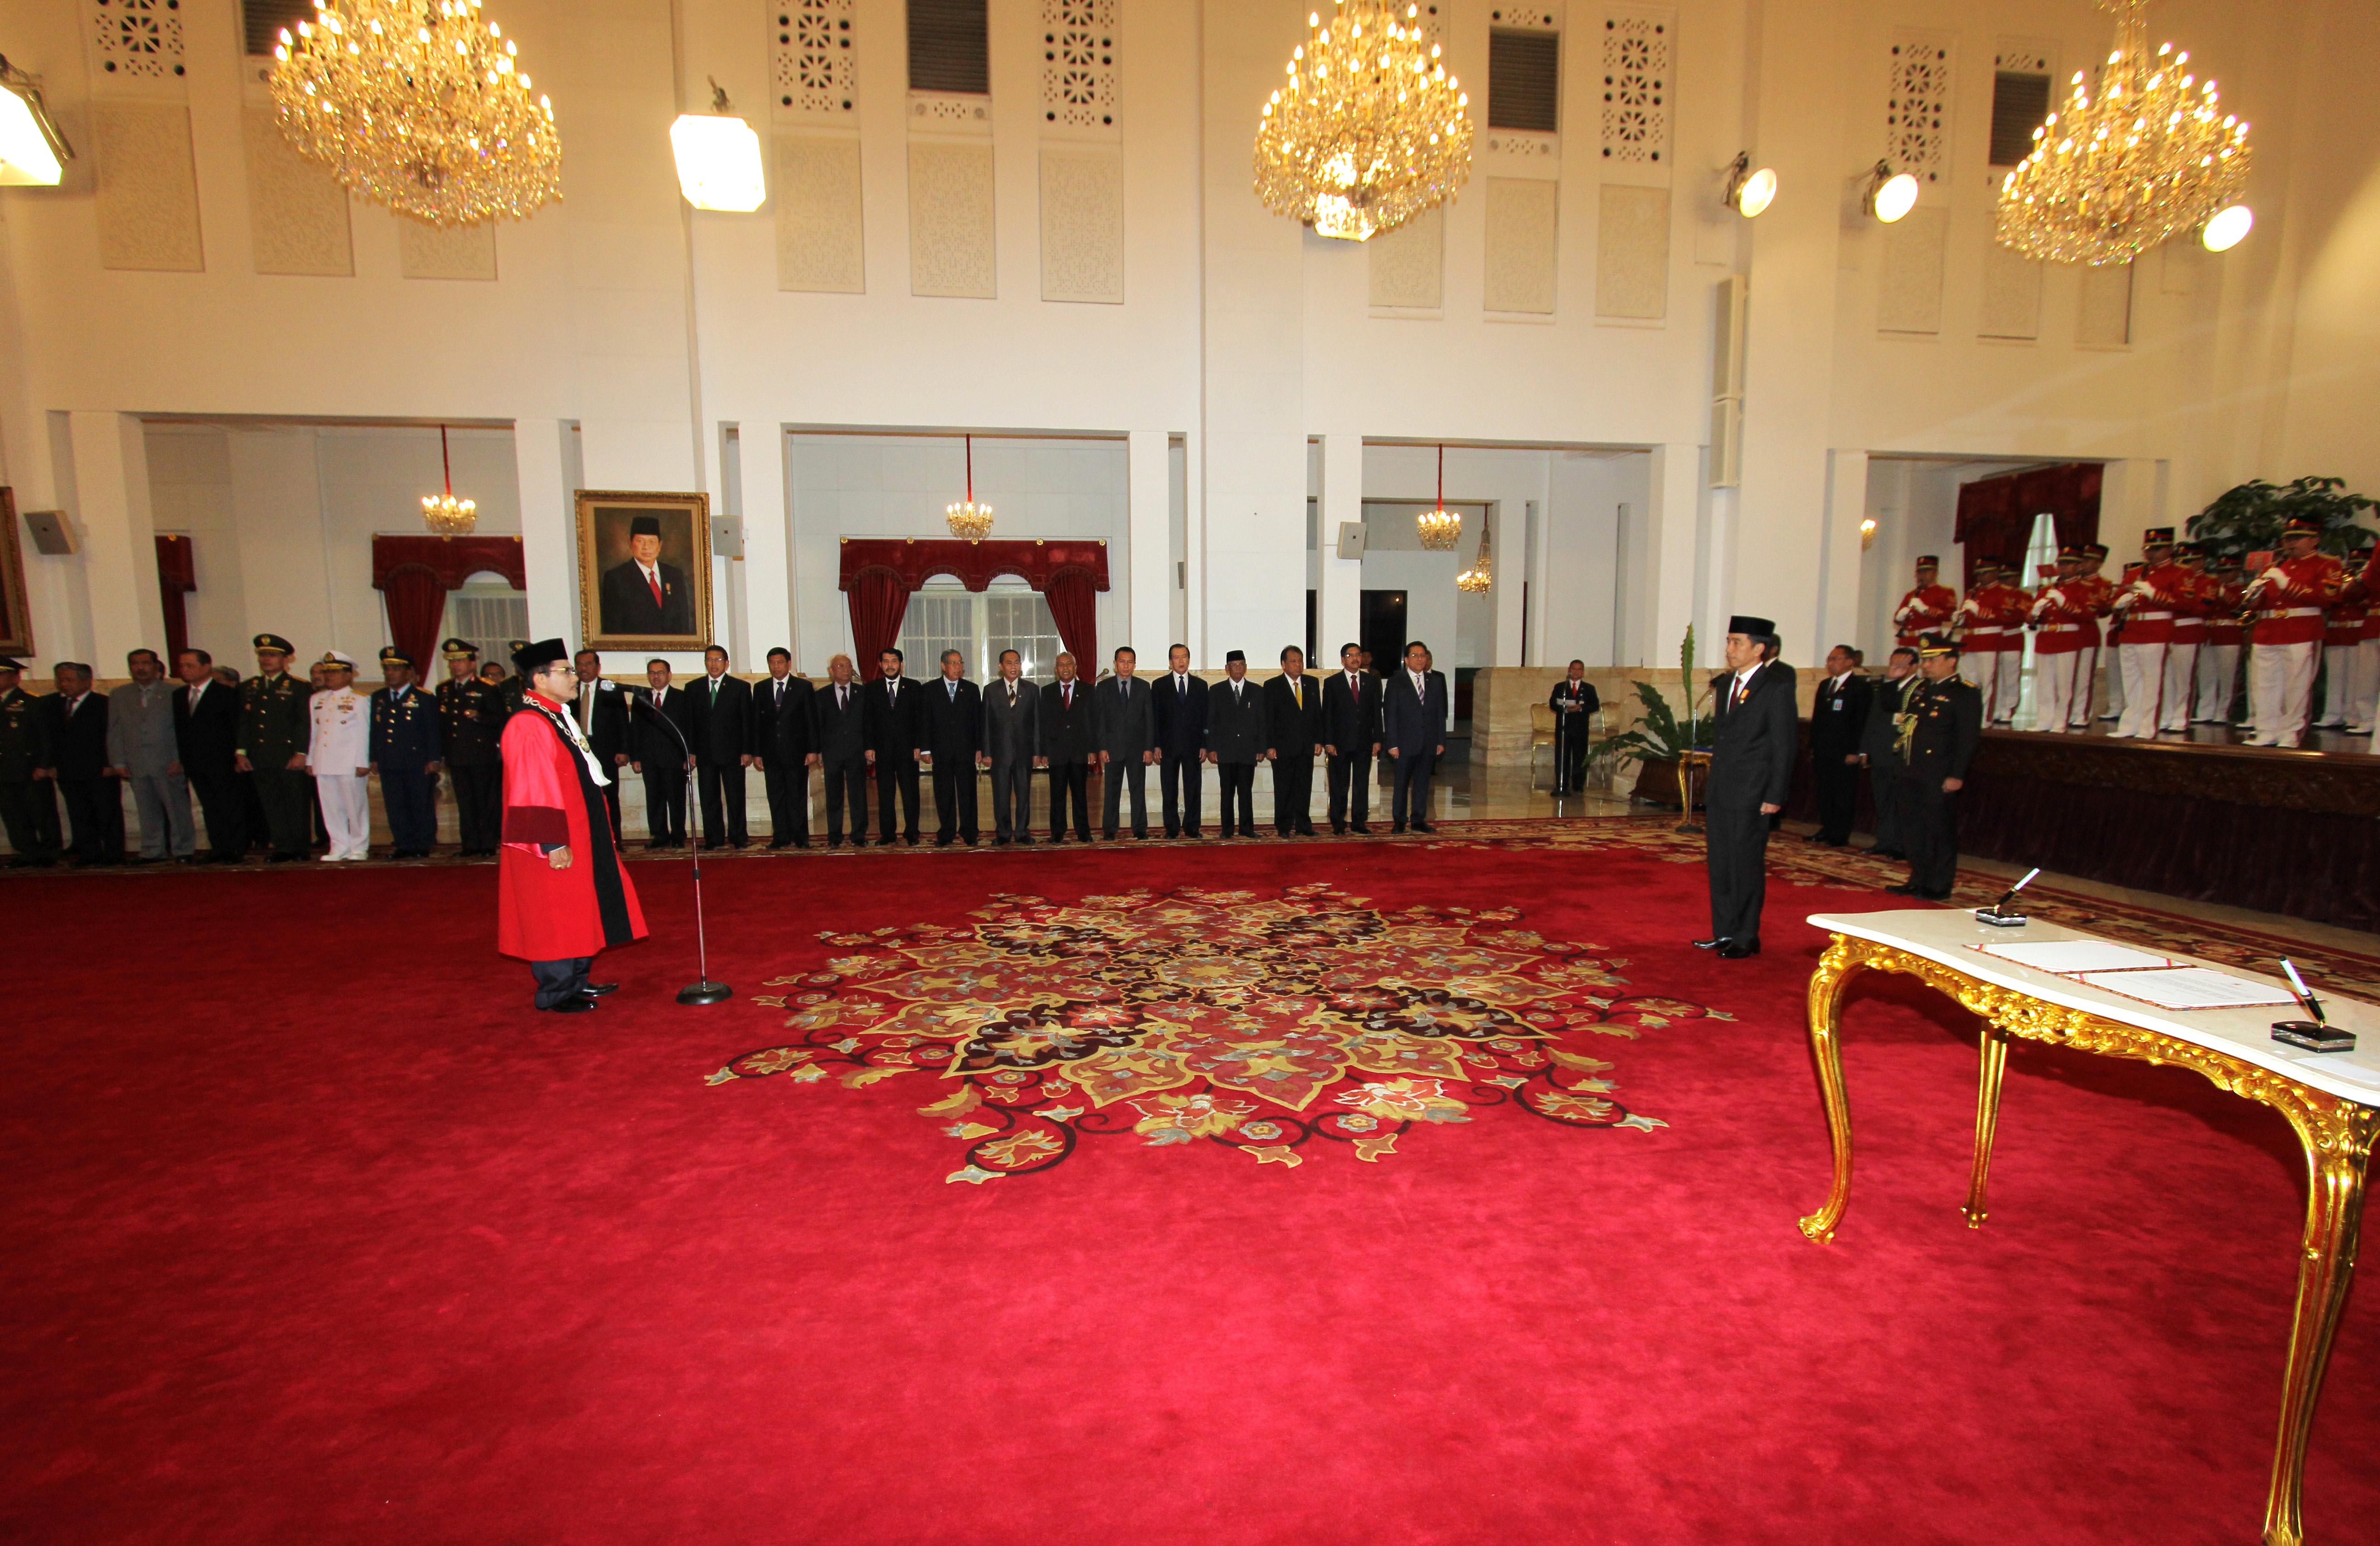 Pengucapan Sumpah Hakim Konstitusi Manahan Sitompul di hadapan Presiden Republik Indonesia di Istana Negara